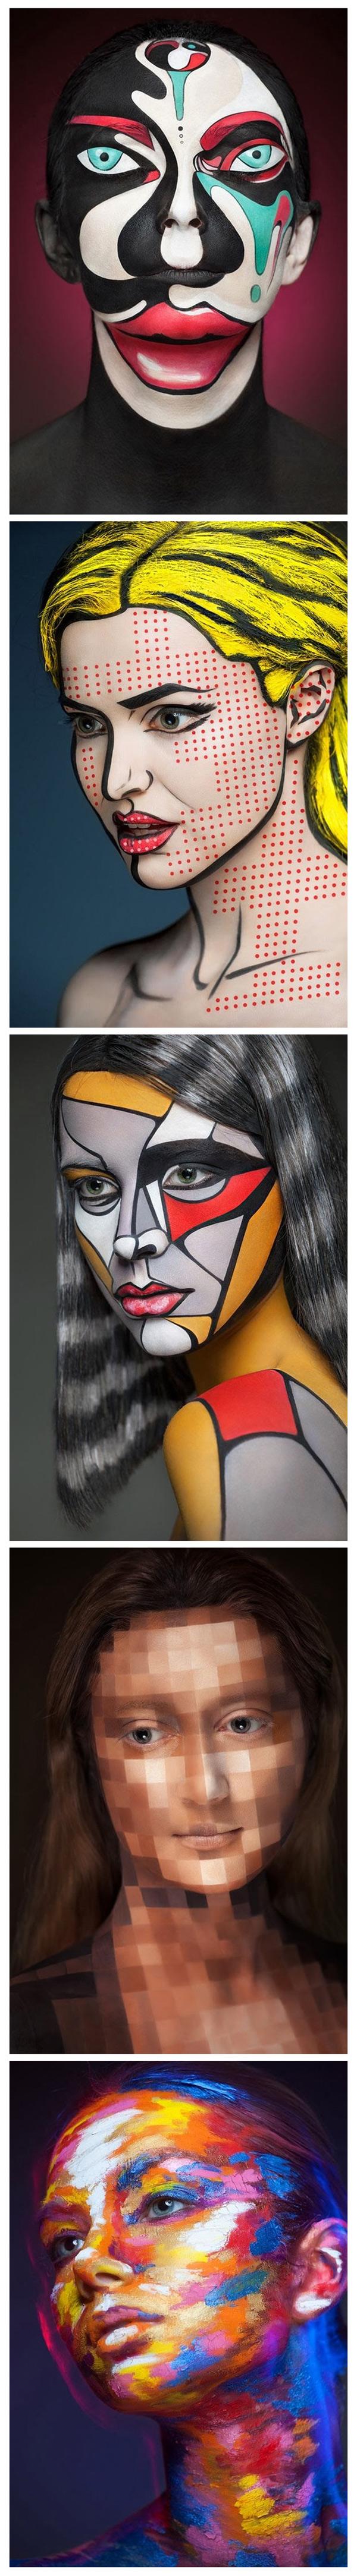 Maquillaje de Alexander Khokhlov